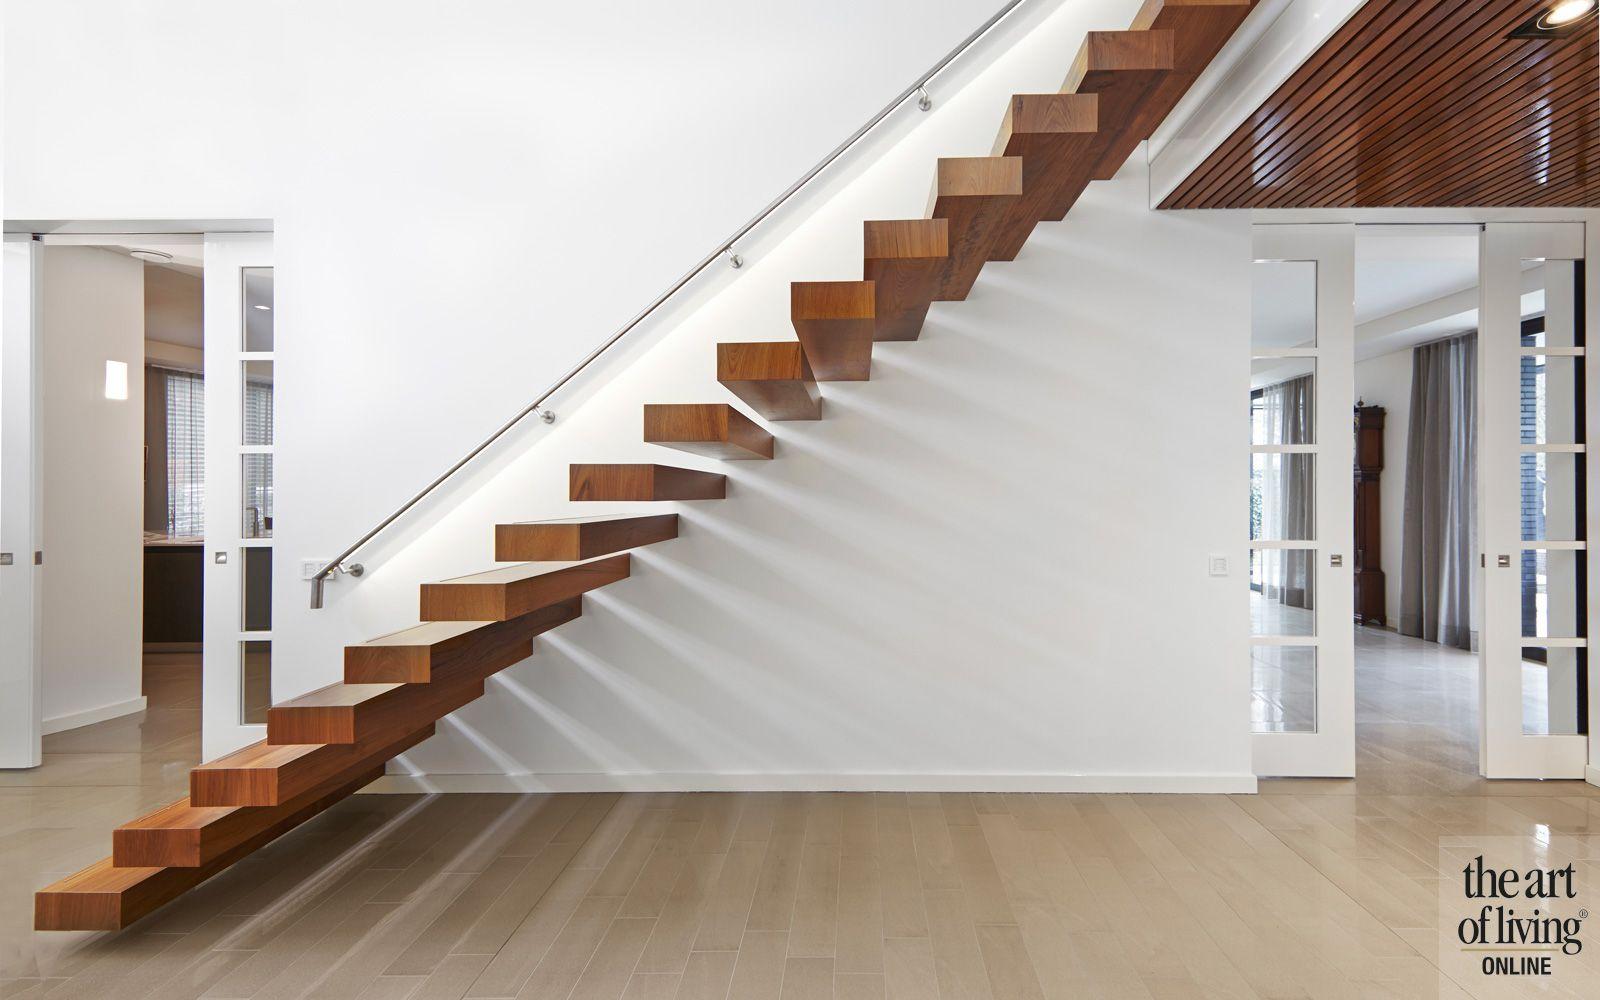 Strak design zwevende trap interieurarchitect marco daverveld